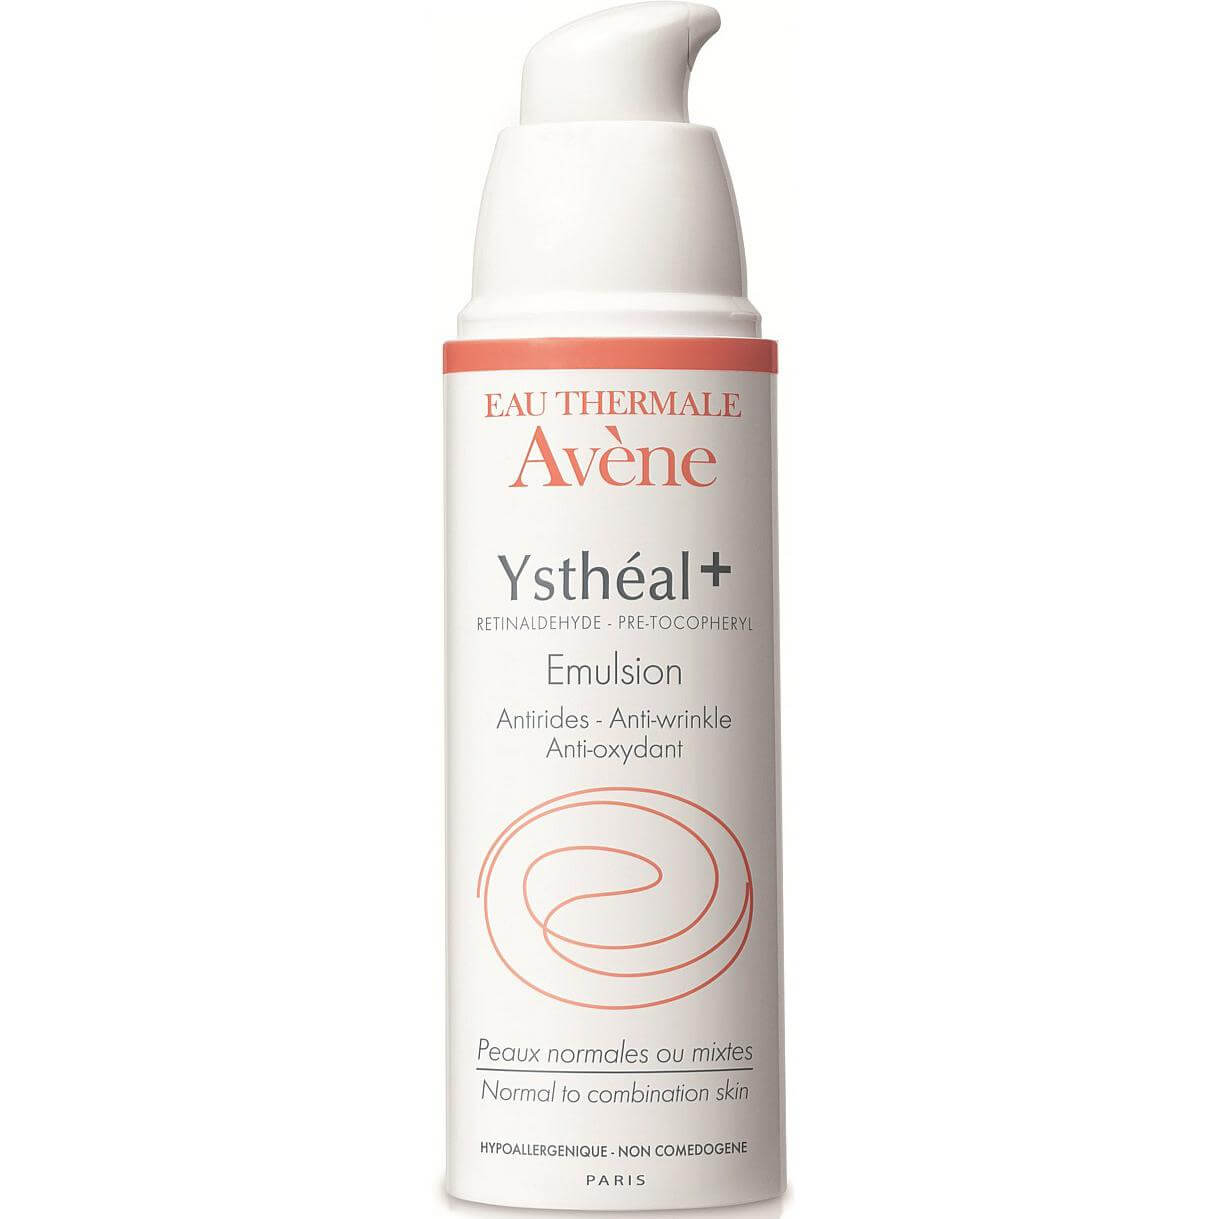 Avene Ystheal Emulsion Λεπτόρρευστο Γαλάκτωμα με Ο.G.G. για τις Πρώτες Ρυτίδες & Λάμψη 30ml